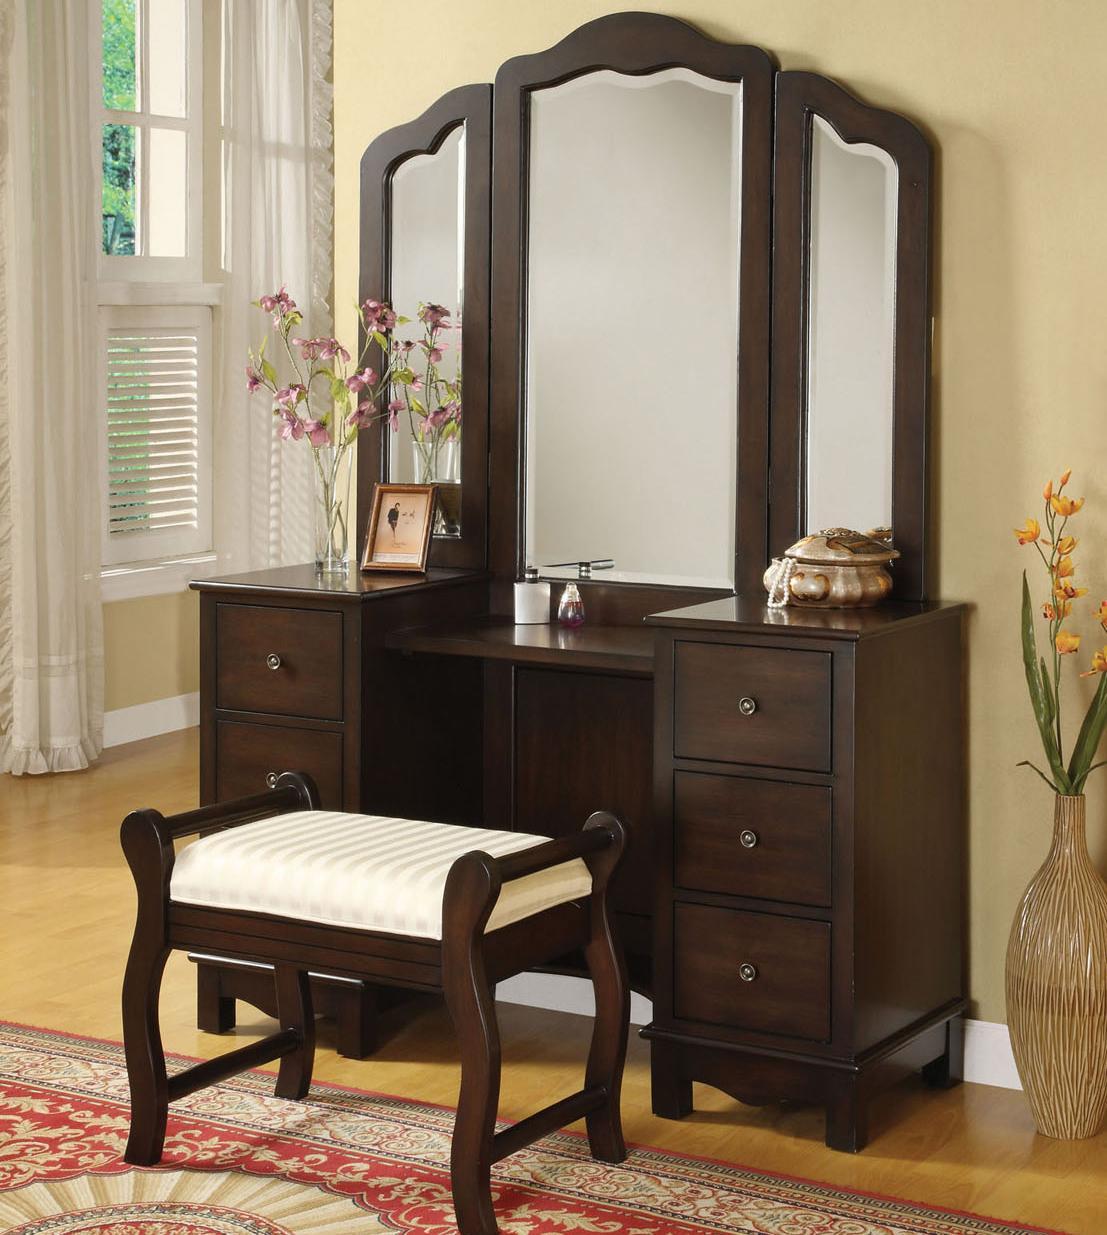 Annapolis Vanity Set by Acme Furniture at Carolina Direct